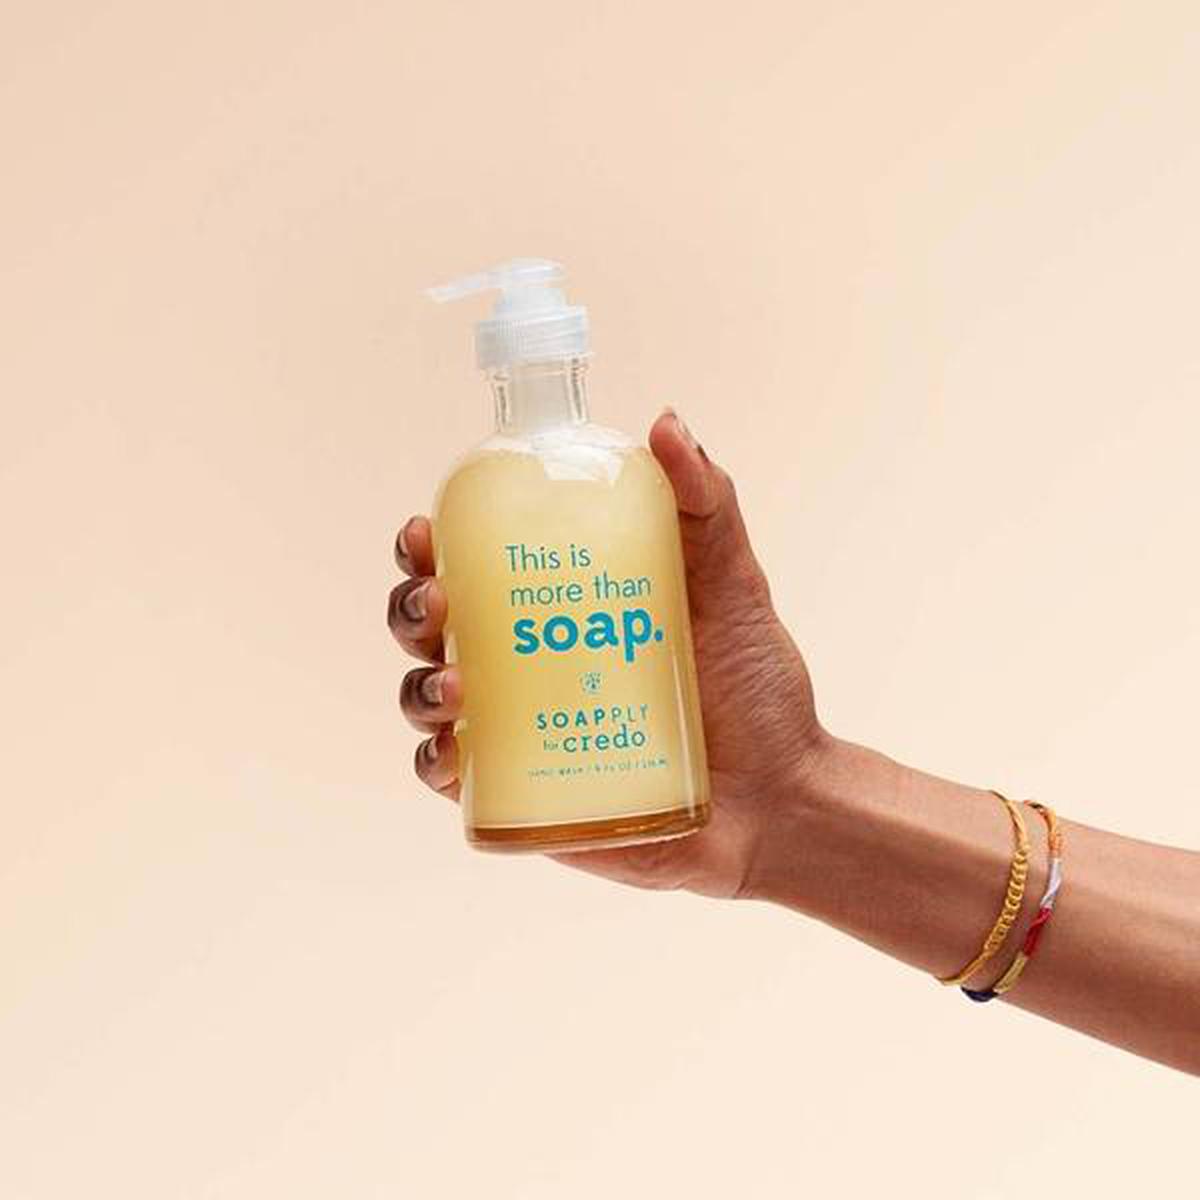 Soapply for Credo Liquid Hand Wash